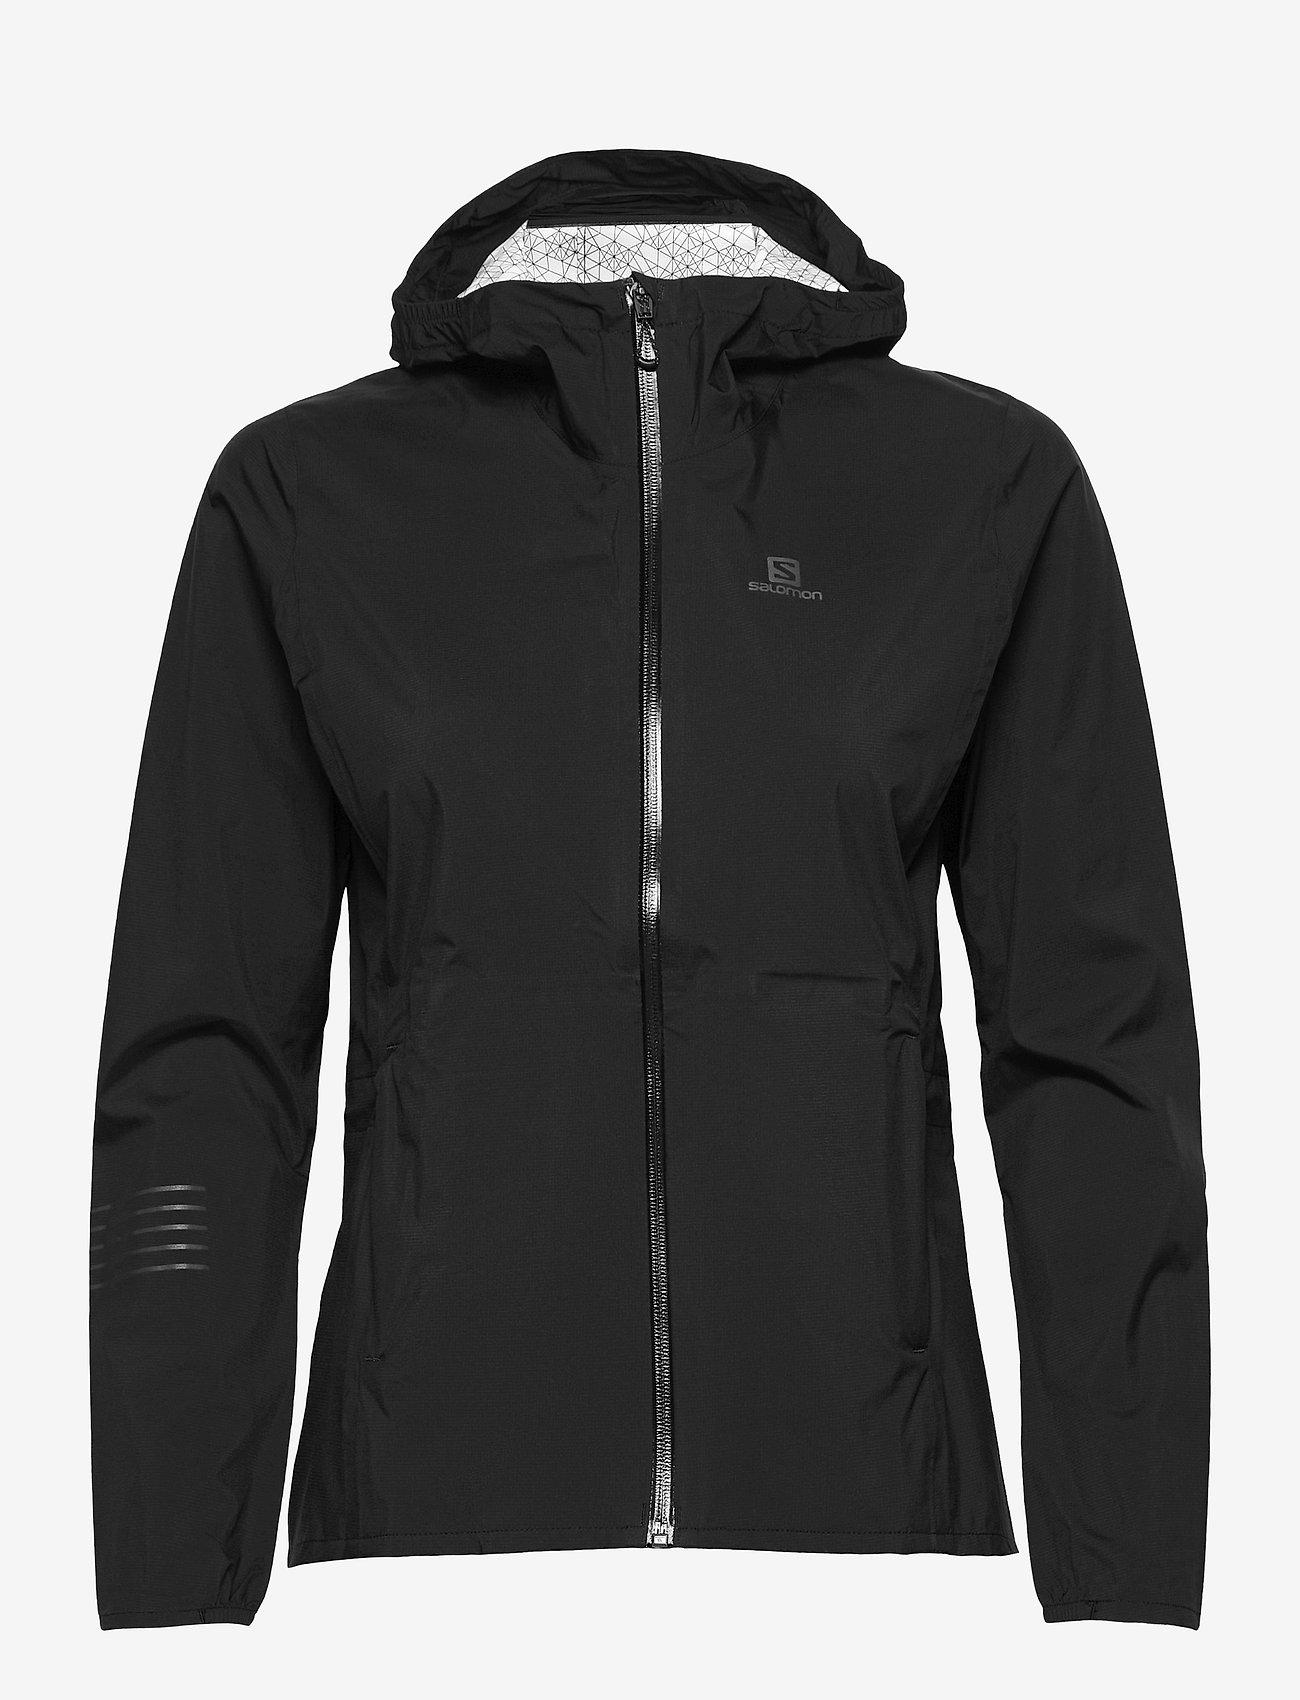 Salomon - LIGHTNING WP JKT W Black - training jackets - black - 0